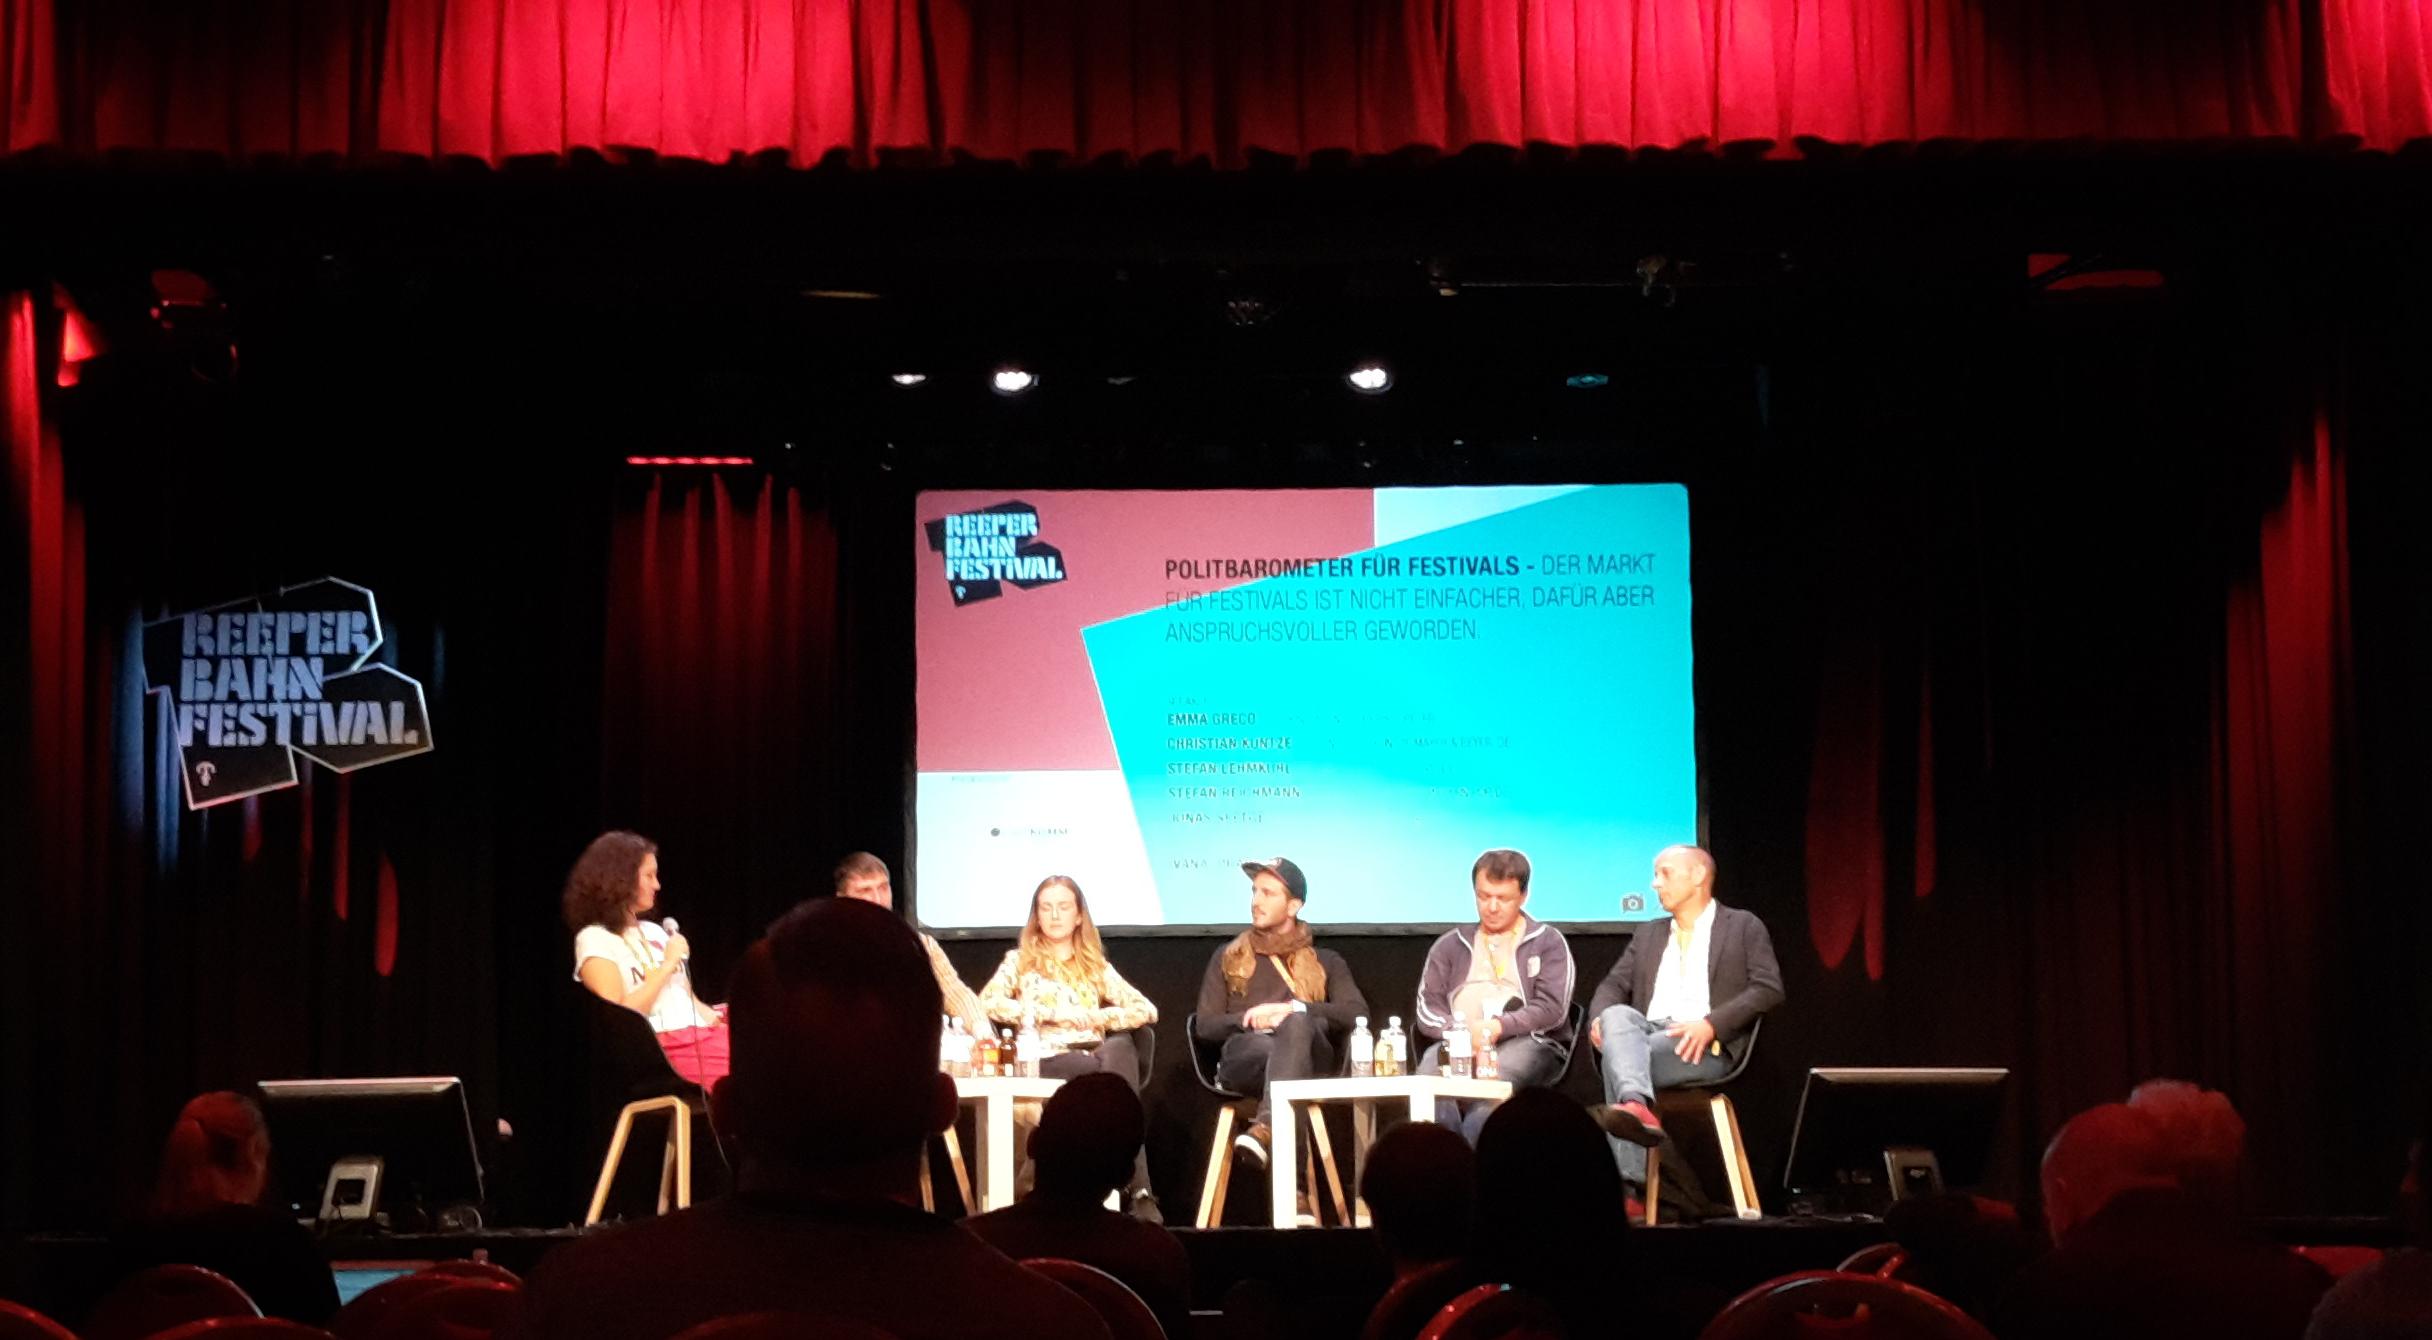 Politbarometer für Festivals - Panel beim Reeperbahn Festival 2017